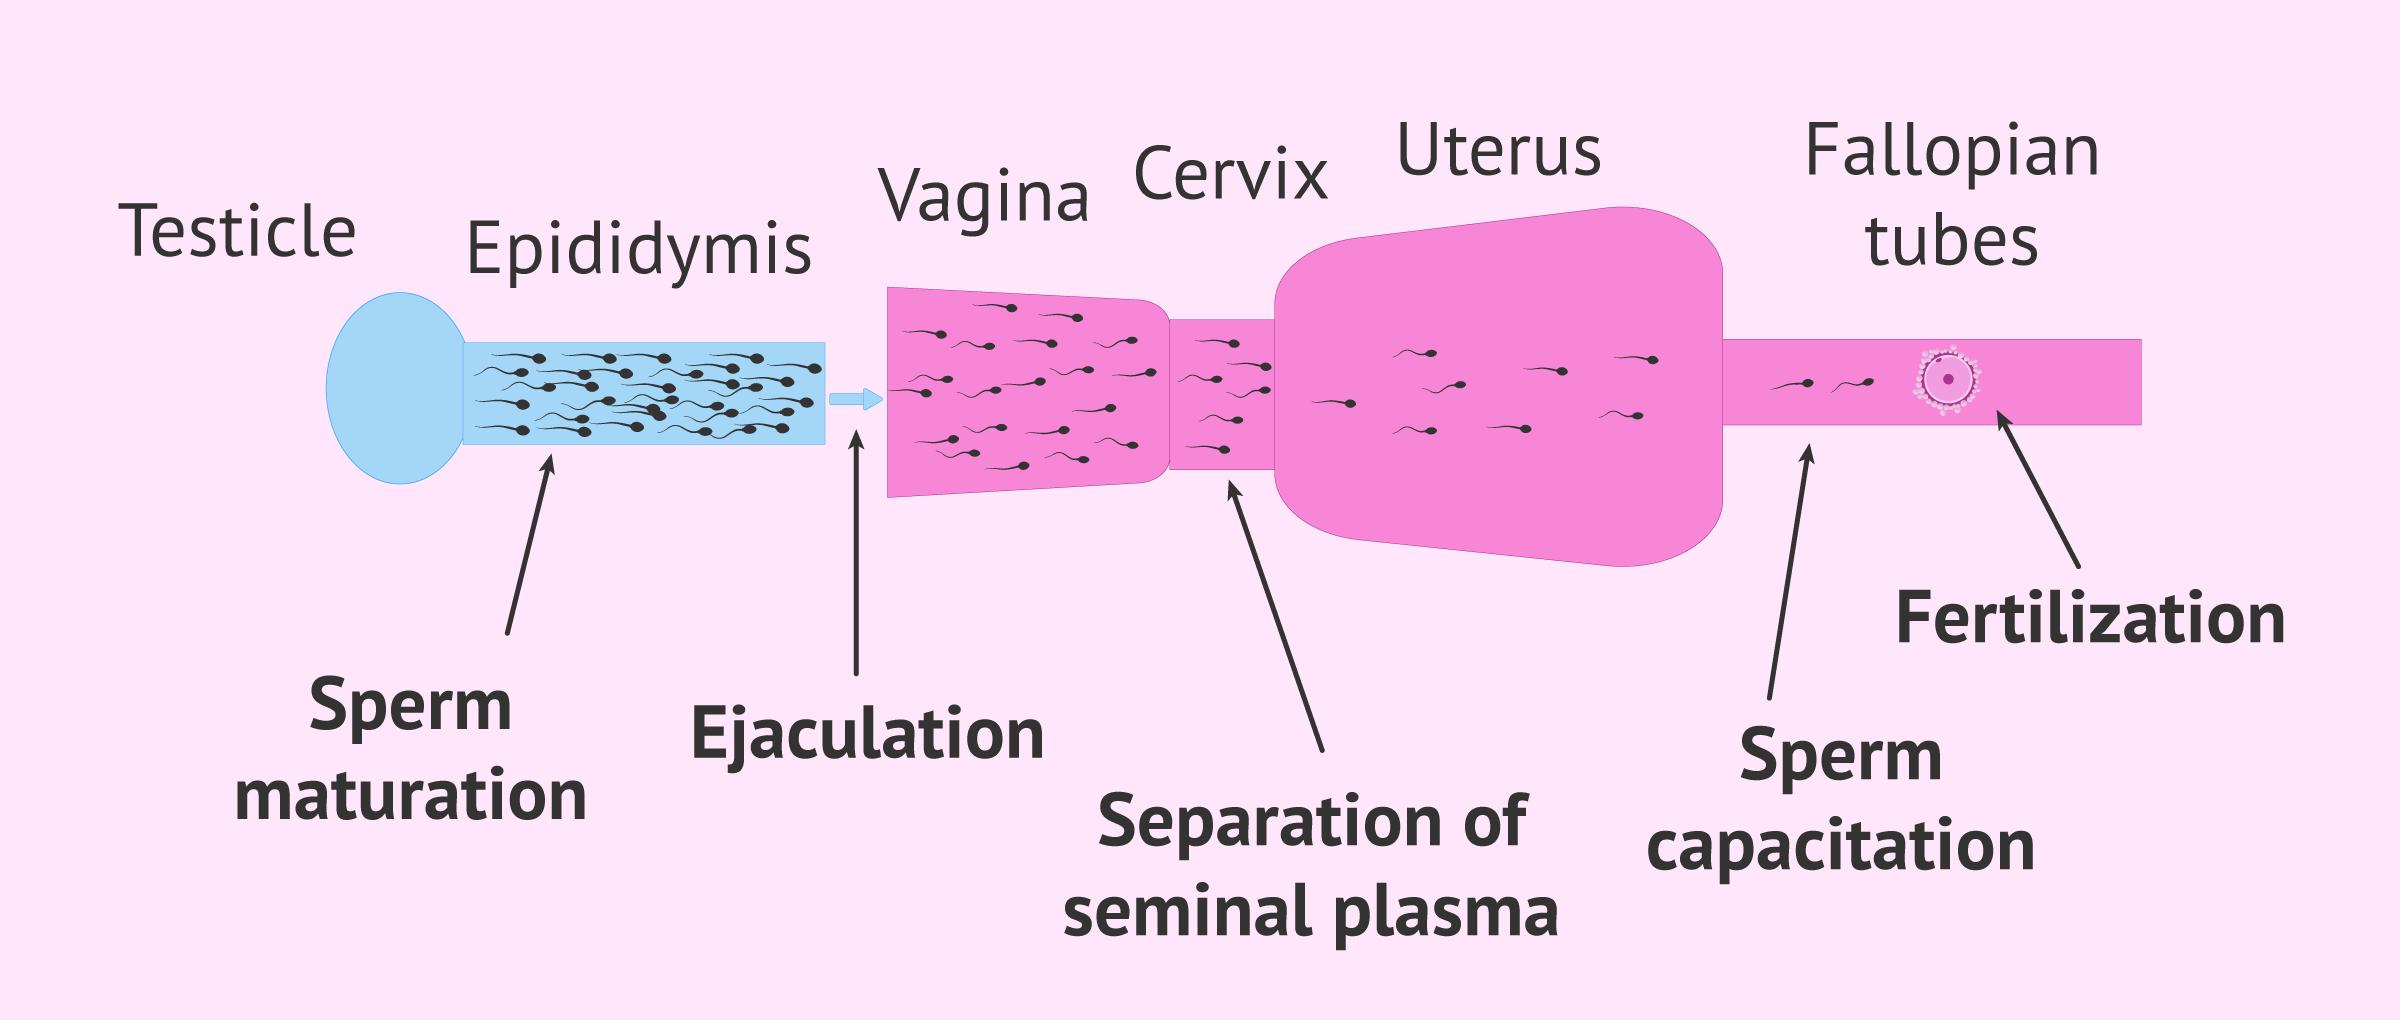 Natural sperm capacitation process